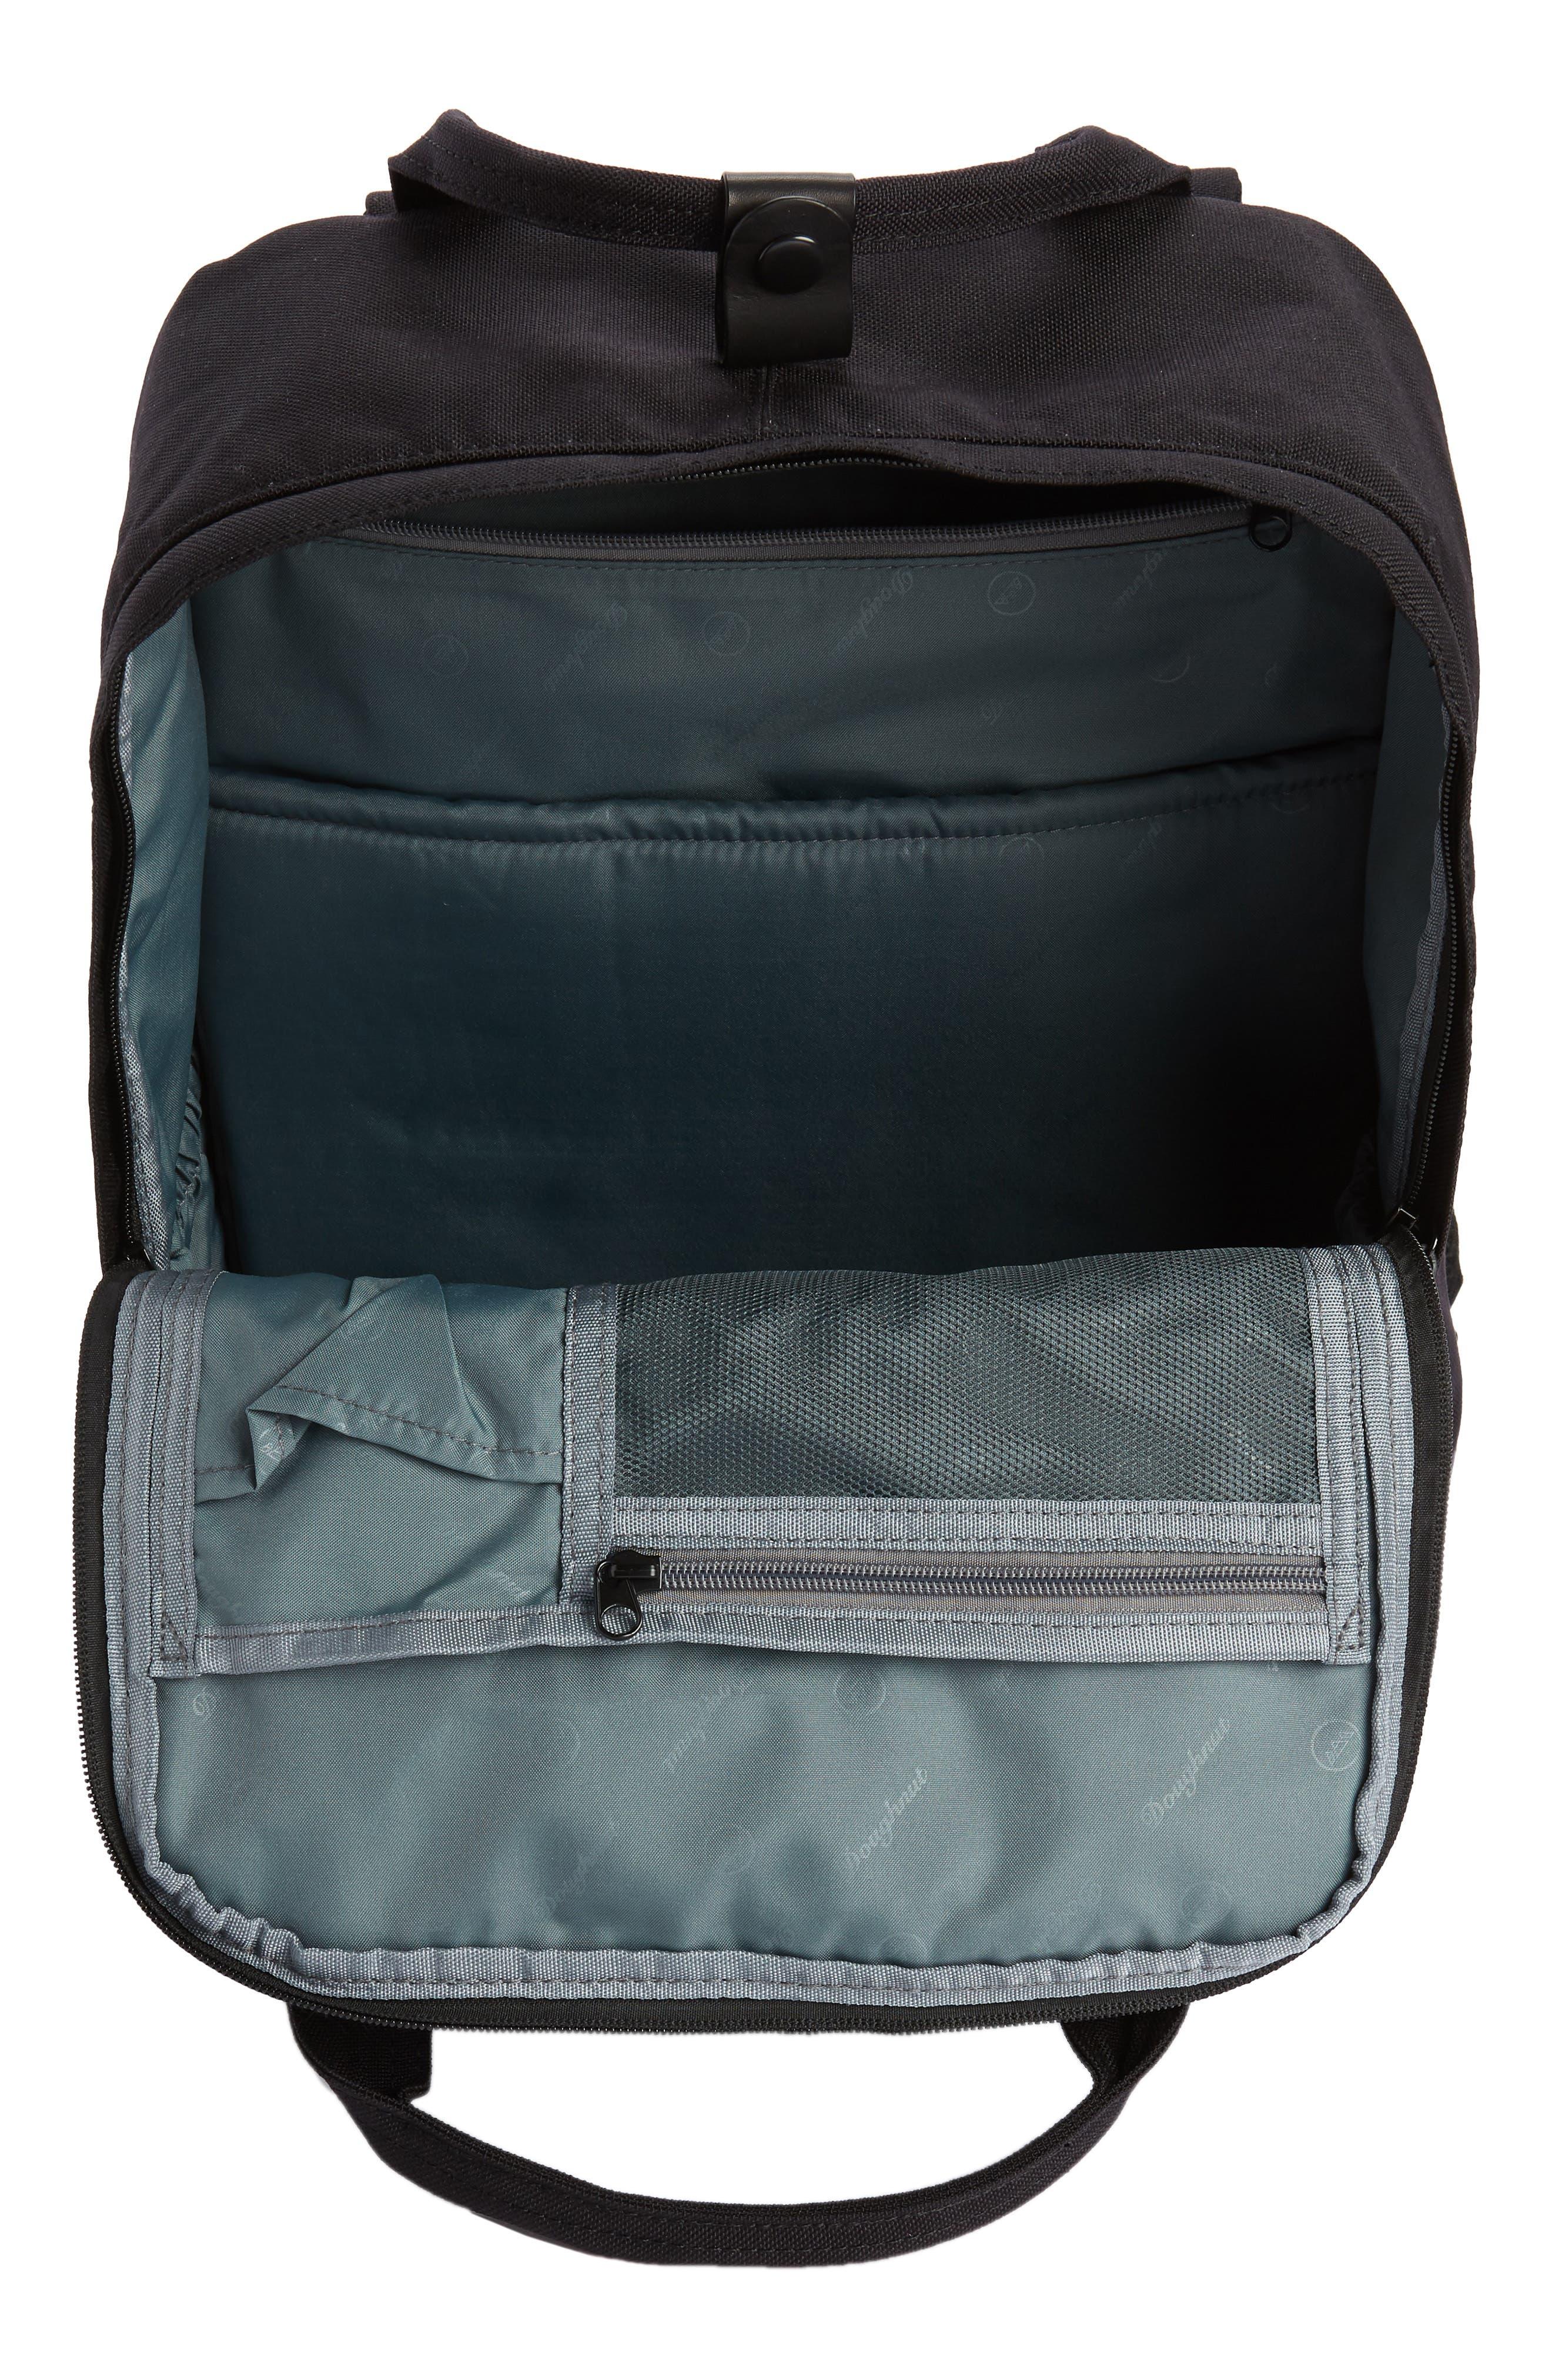 Macaroon Large Cordura<sup>®</sup> Black Series Water Repellent Backpack,                             Alternate thumbnail 4, color,                             001